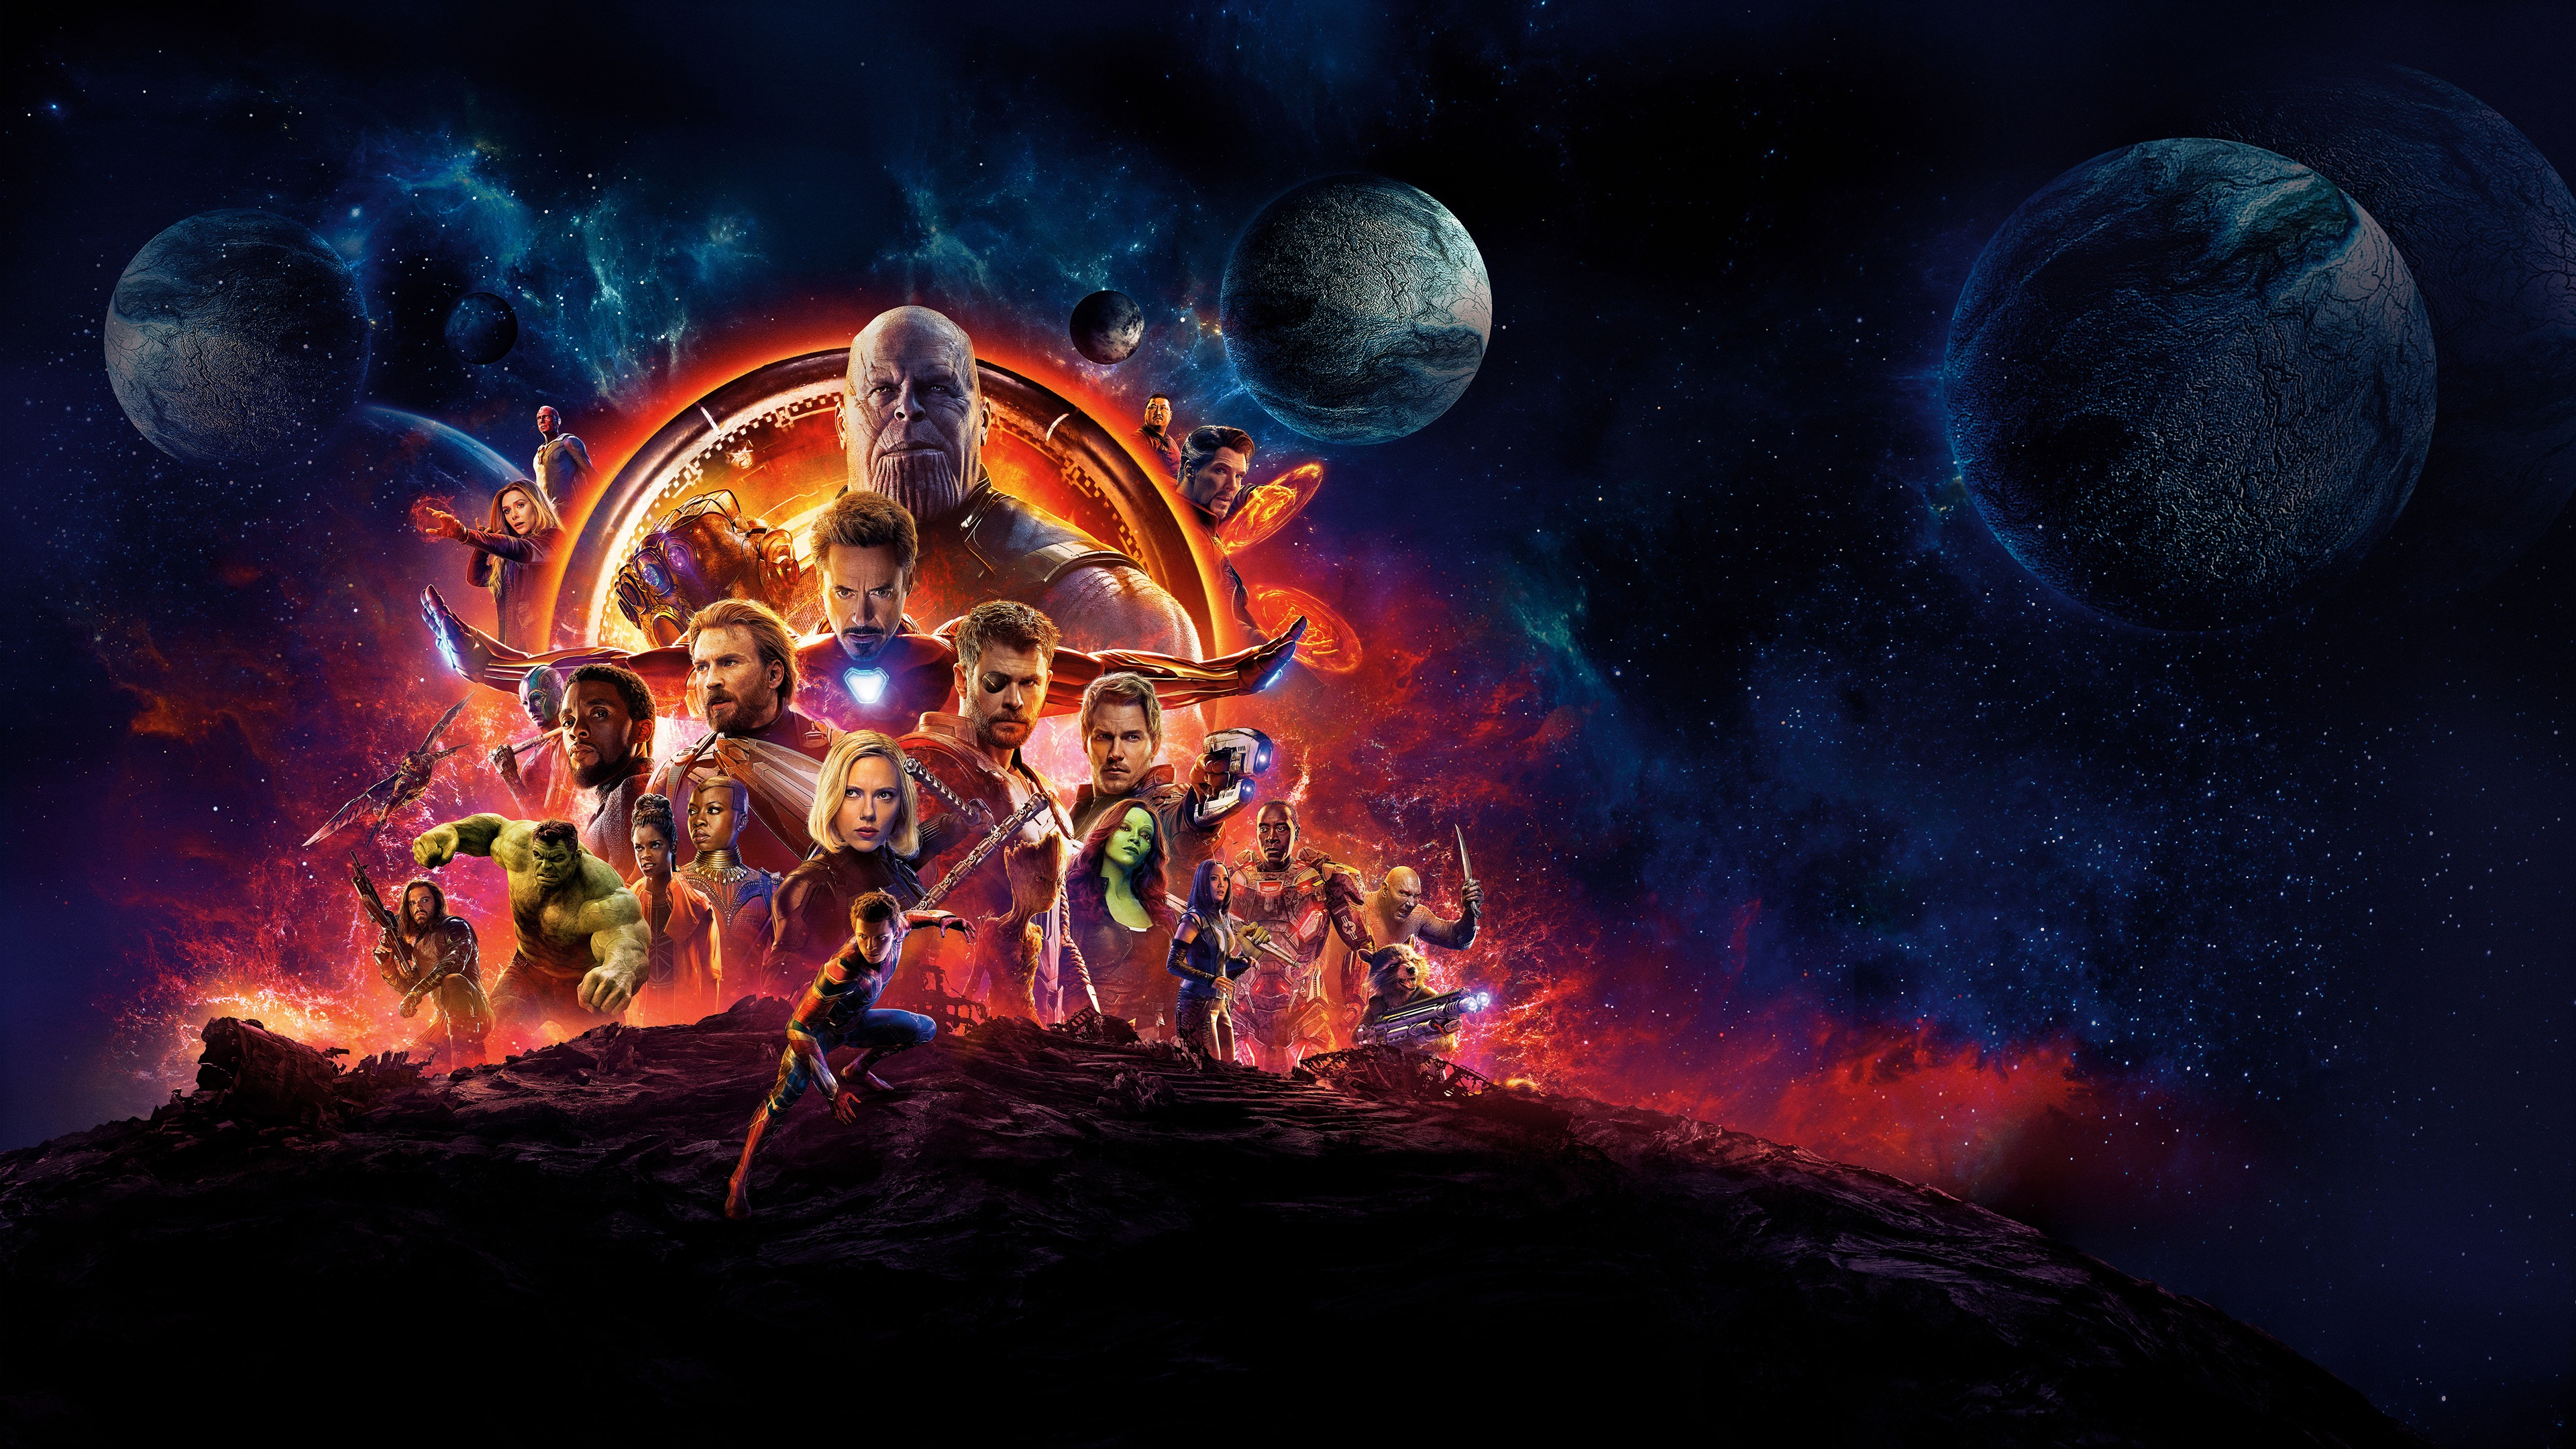 Fonds D écran Film Dc Comics Avengers 3 Guerre à L Infini